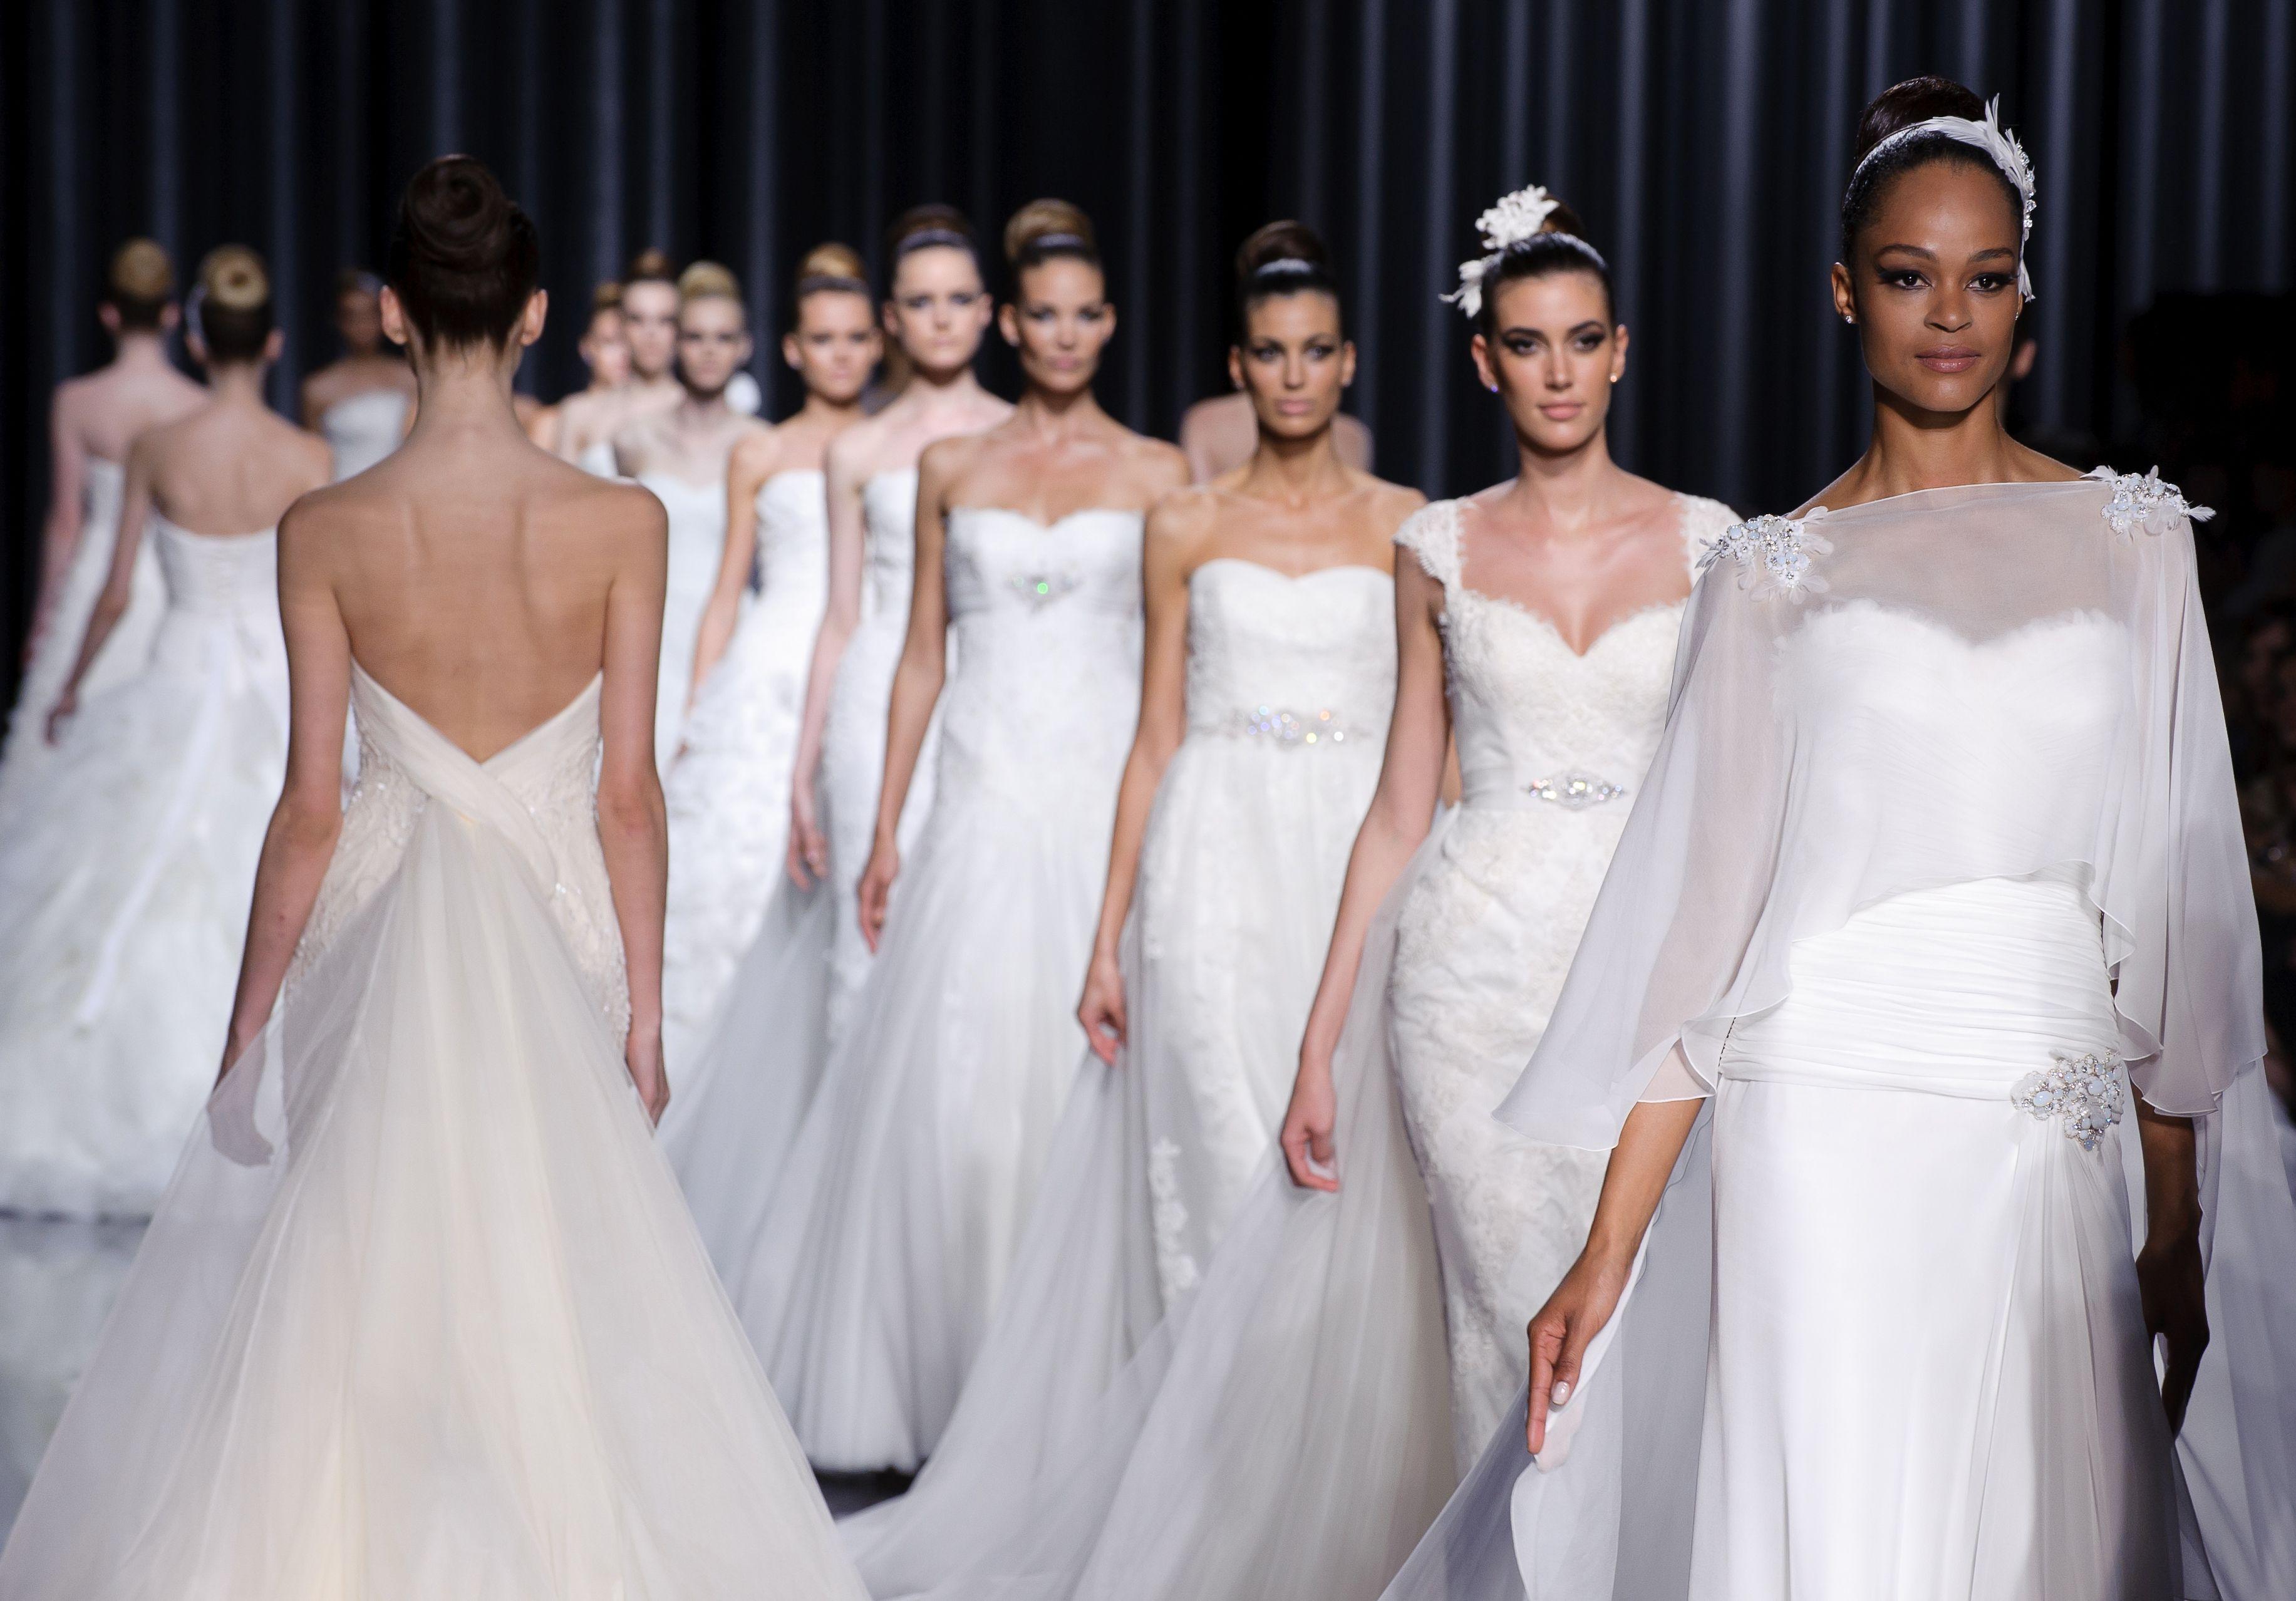 Brands of wedding dresses weddingdress pinterest bridal this seasons top designer wedding dresses ombrellifo Choice Image